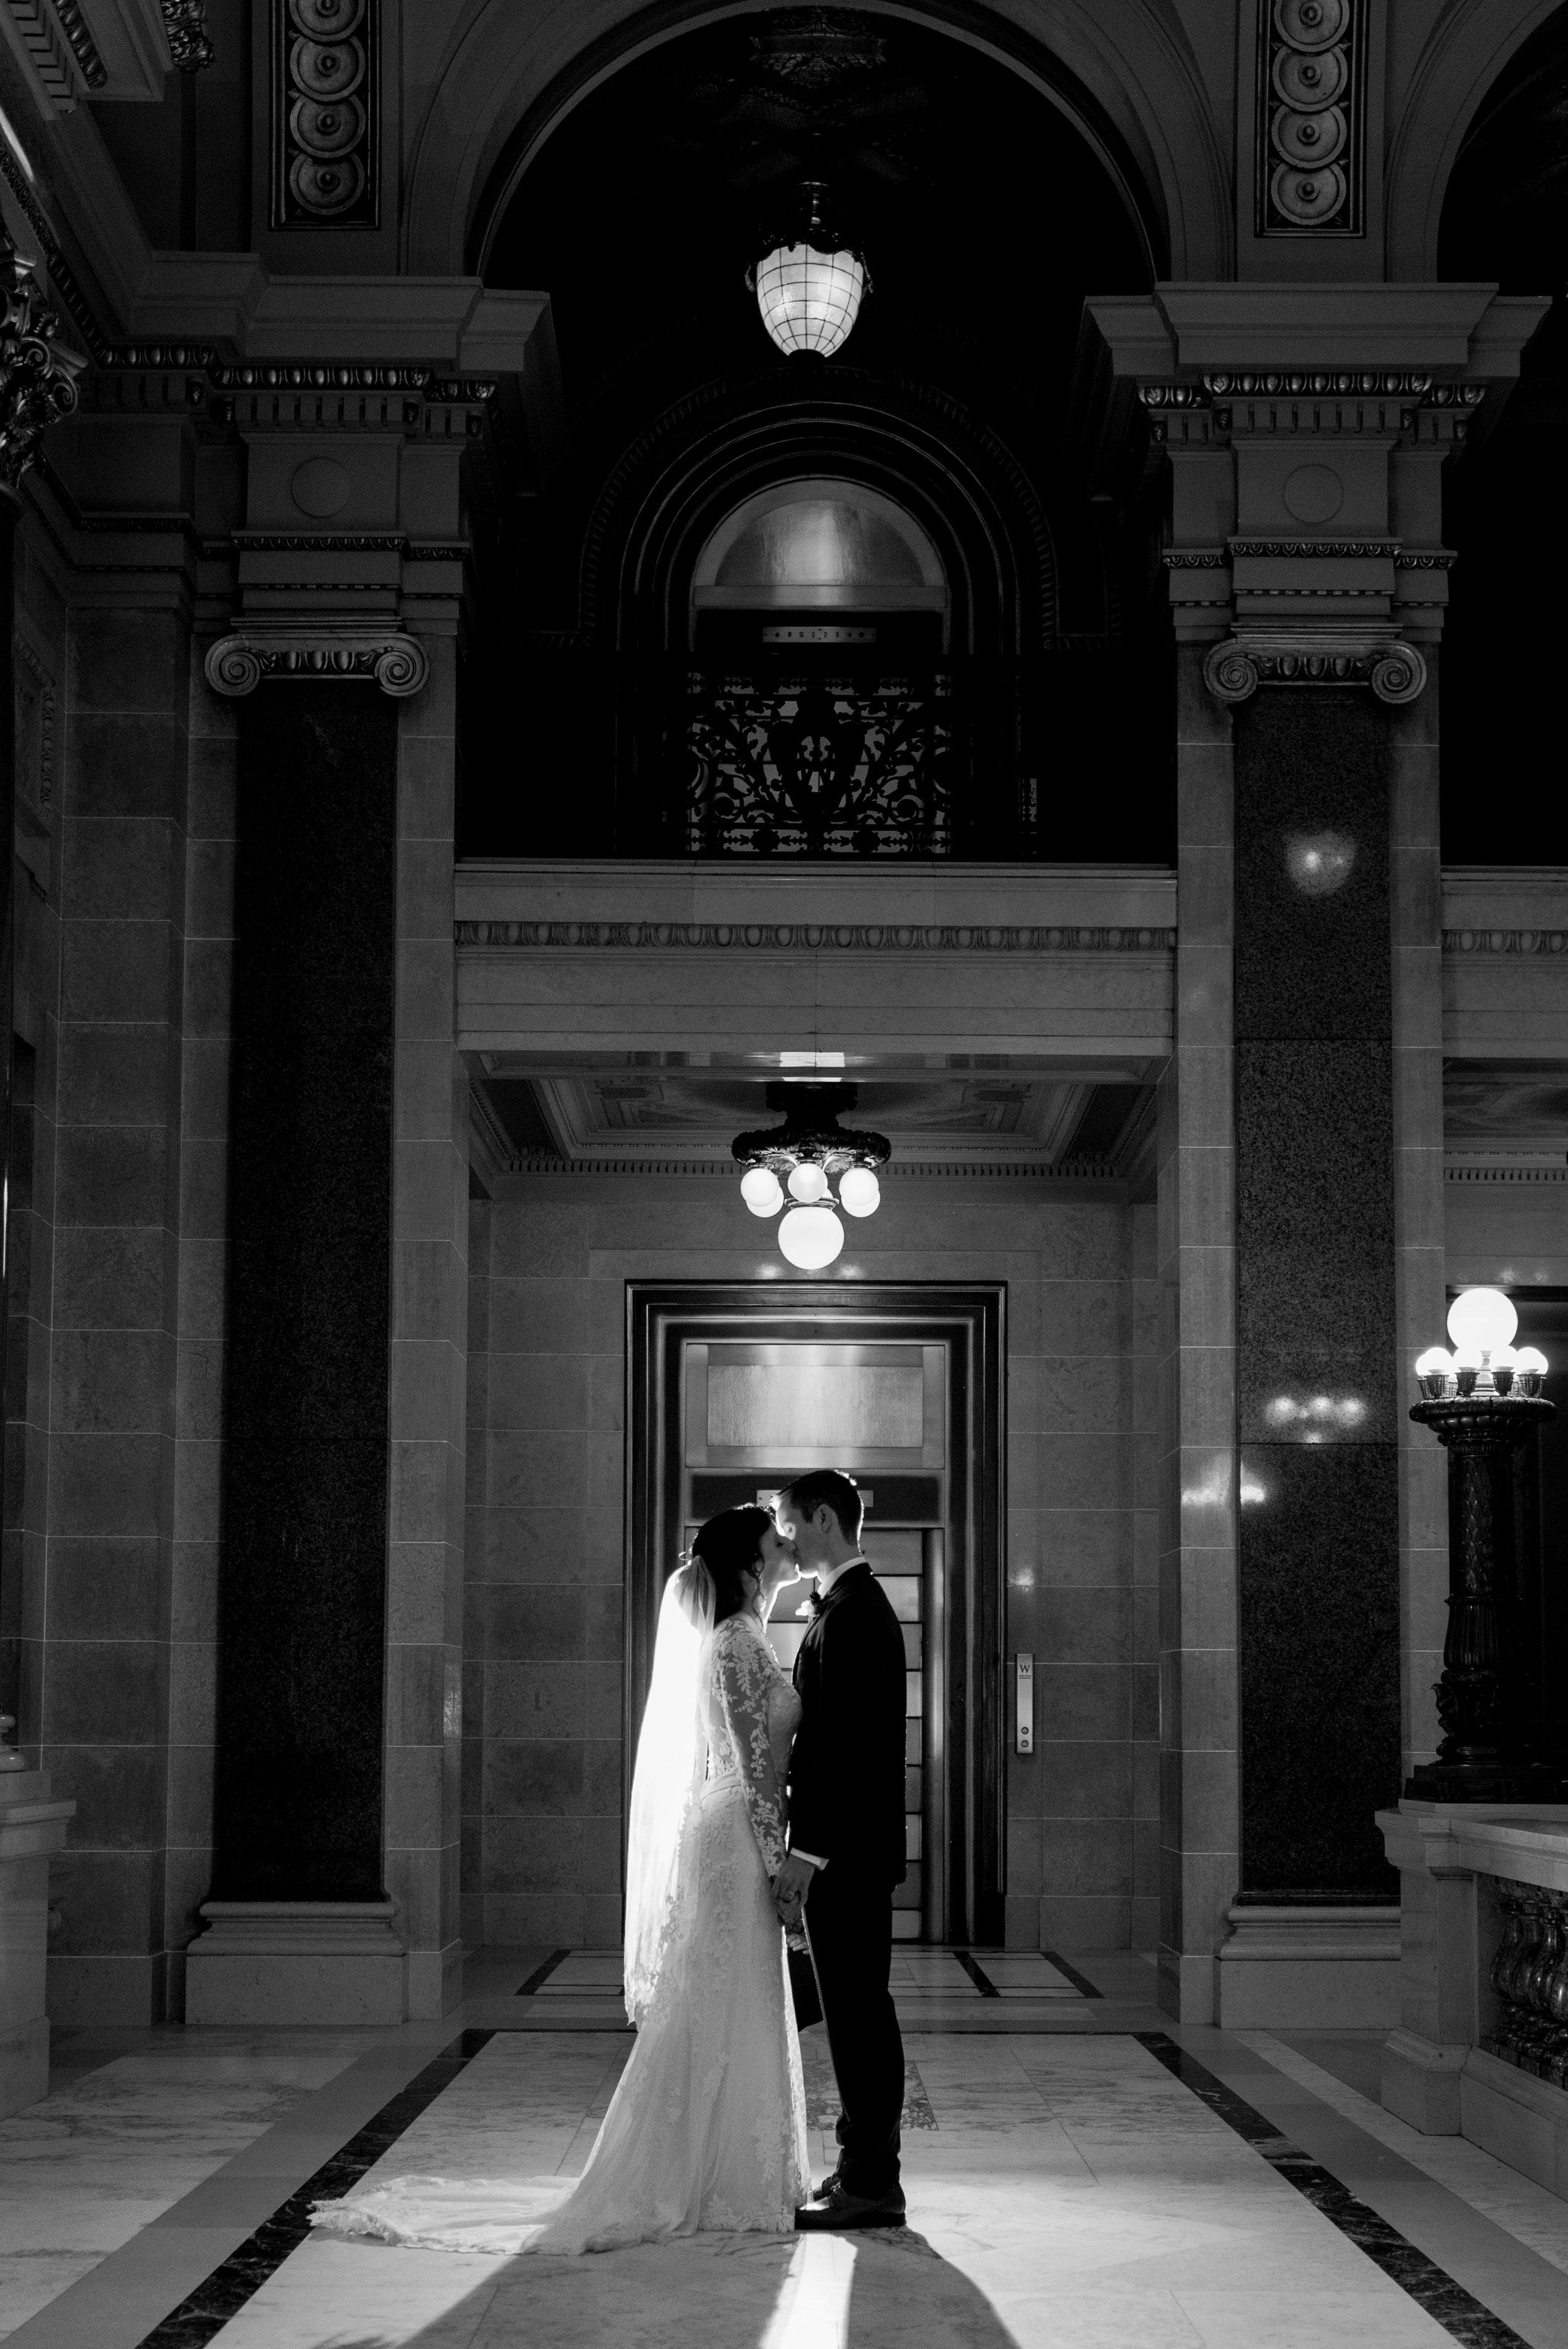 Wisconsin-State-Capitol-Madison-Wisconsin-Wedding-Photos-0001.jpg